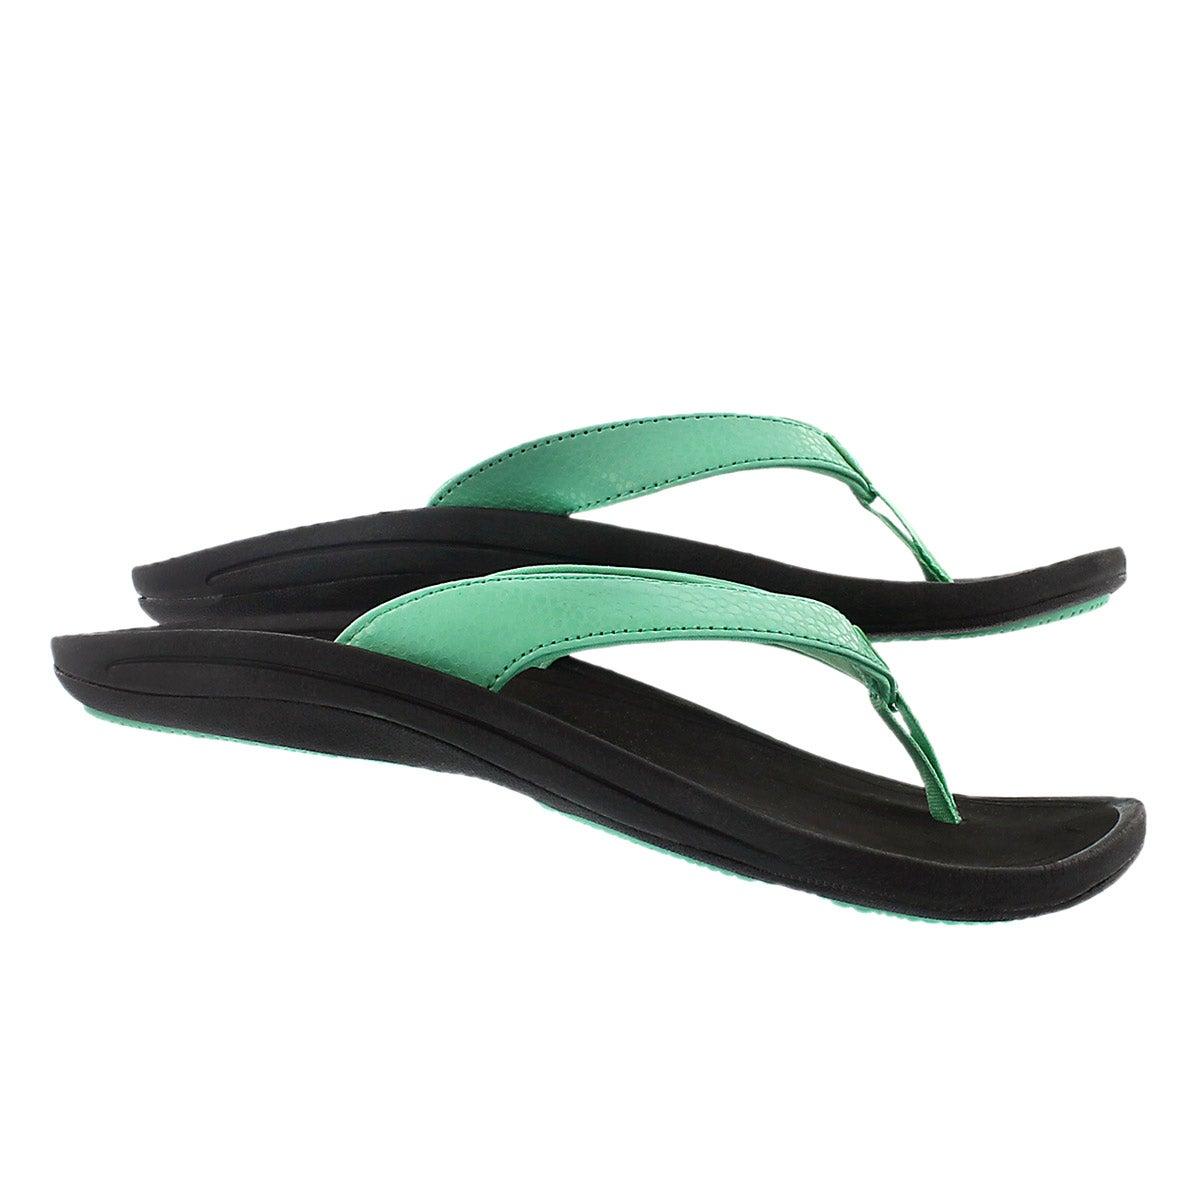 Sandale tong KULAPA KAI, jade pâle, fem